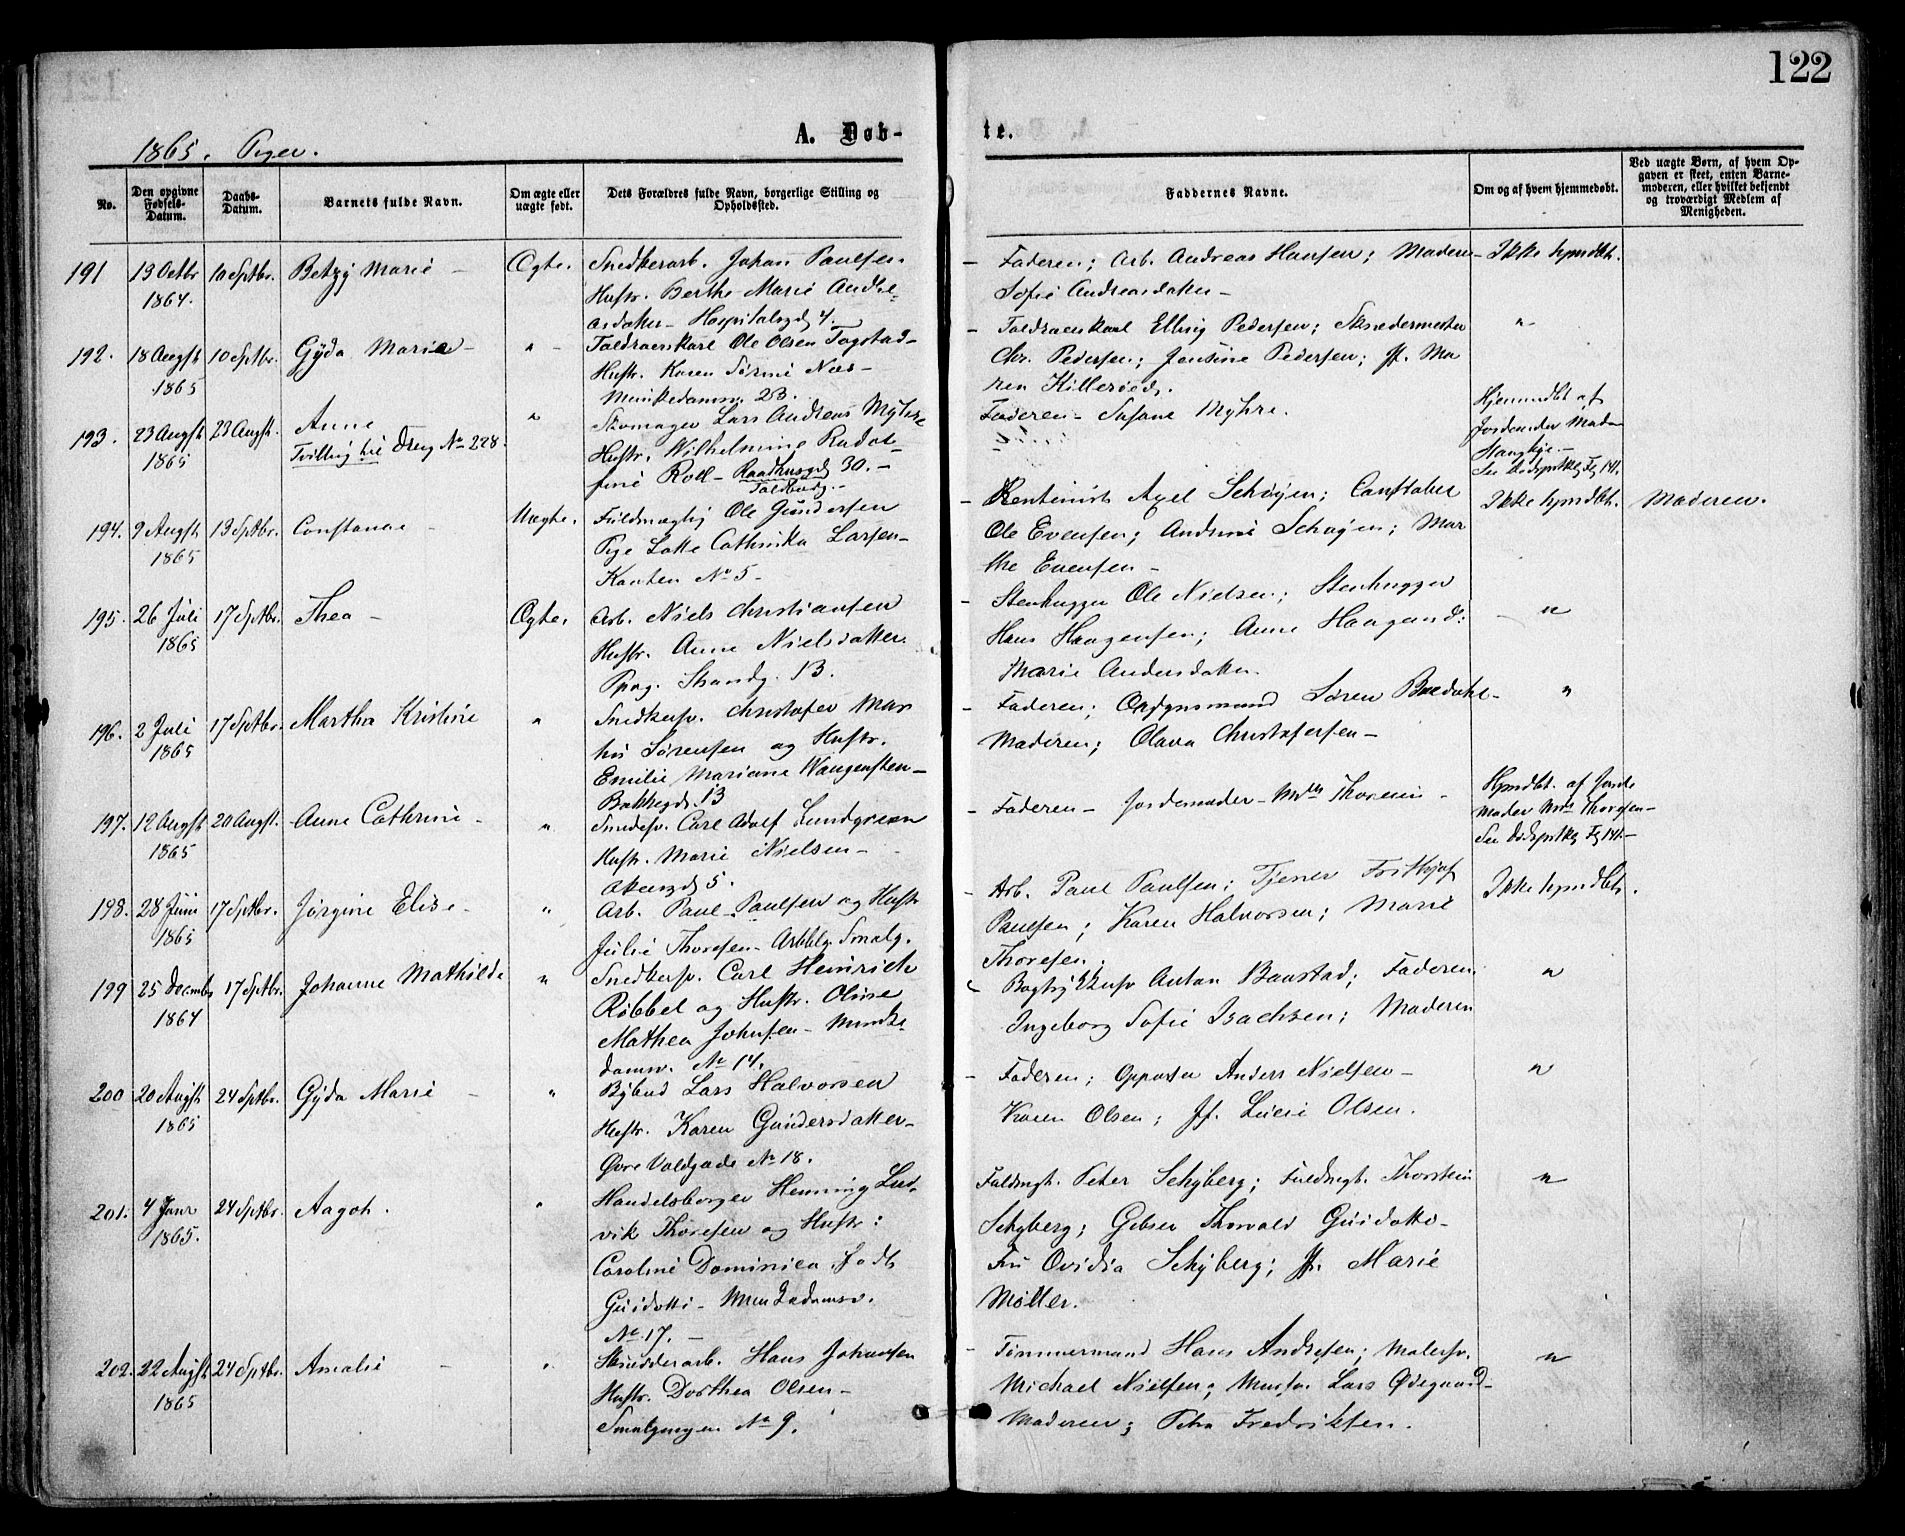 SAO, Trefoldighet prestekontor Kirkebøker, F/Fa/L0002: Parish register (official) no. I 2, 1863-1870, p. 122